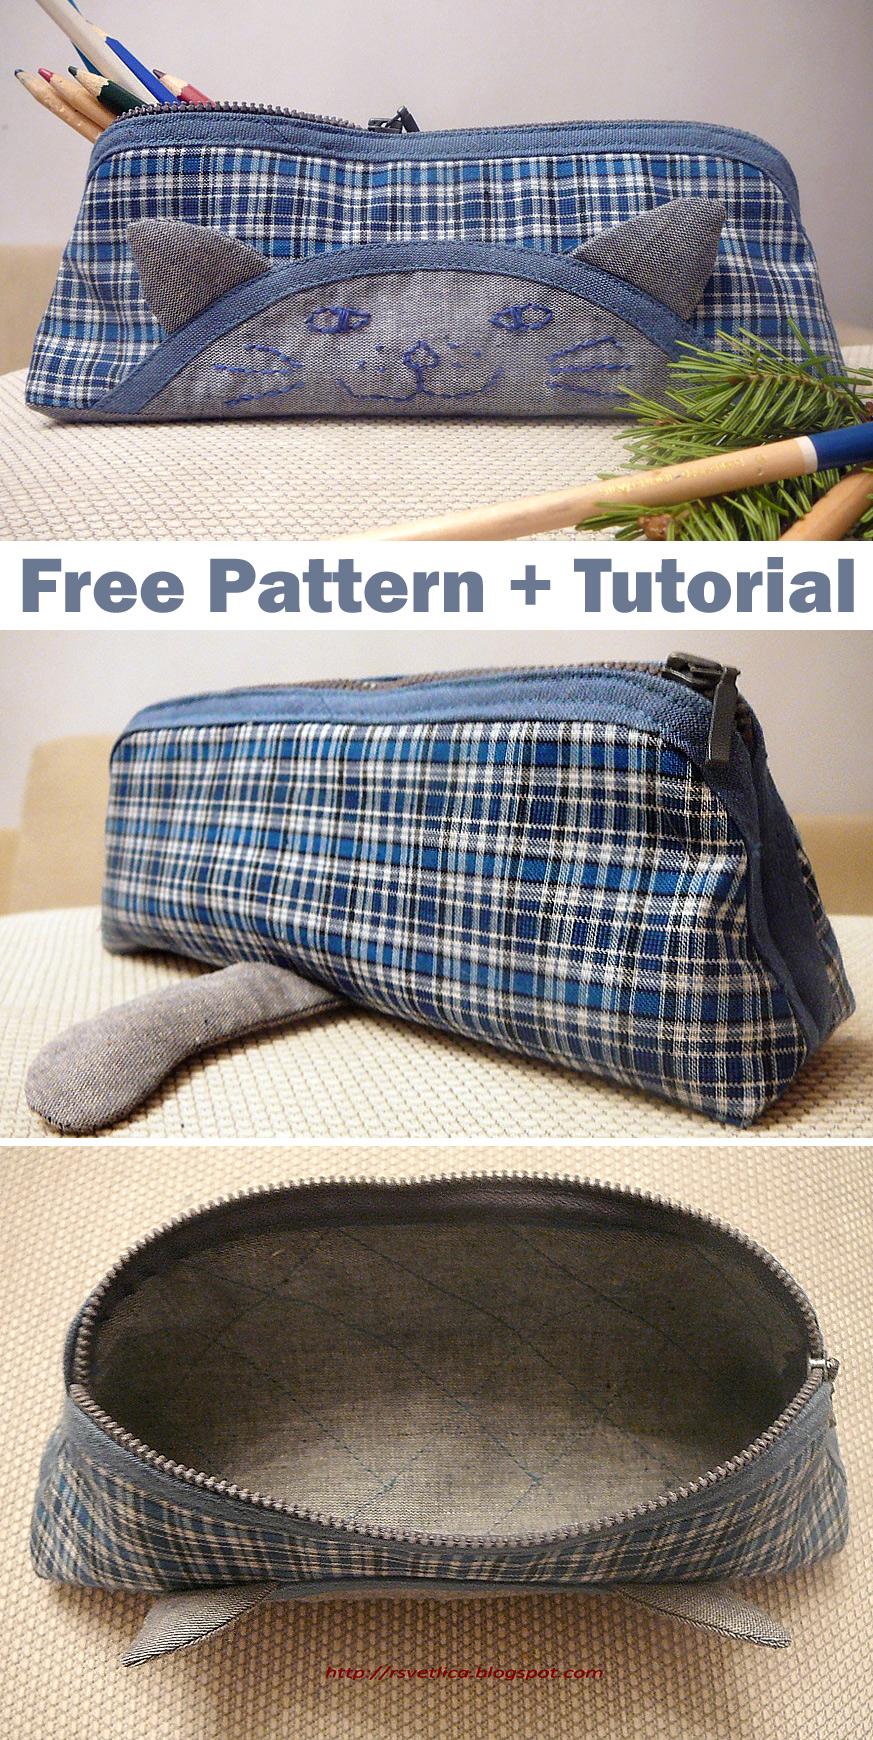 Pencil Case Cat. Free Pattern + Tutorial